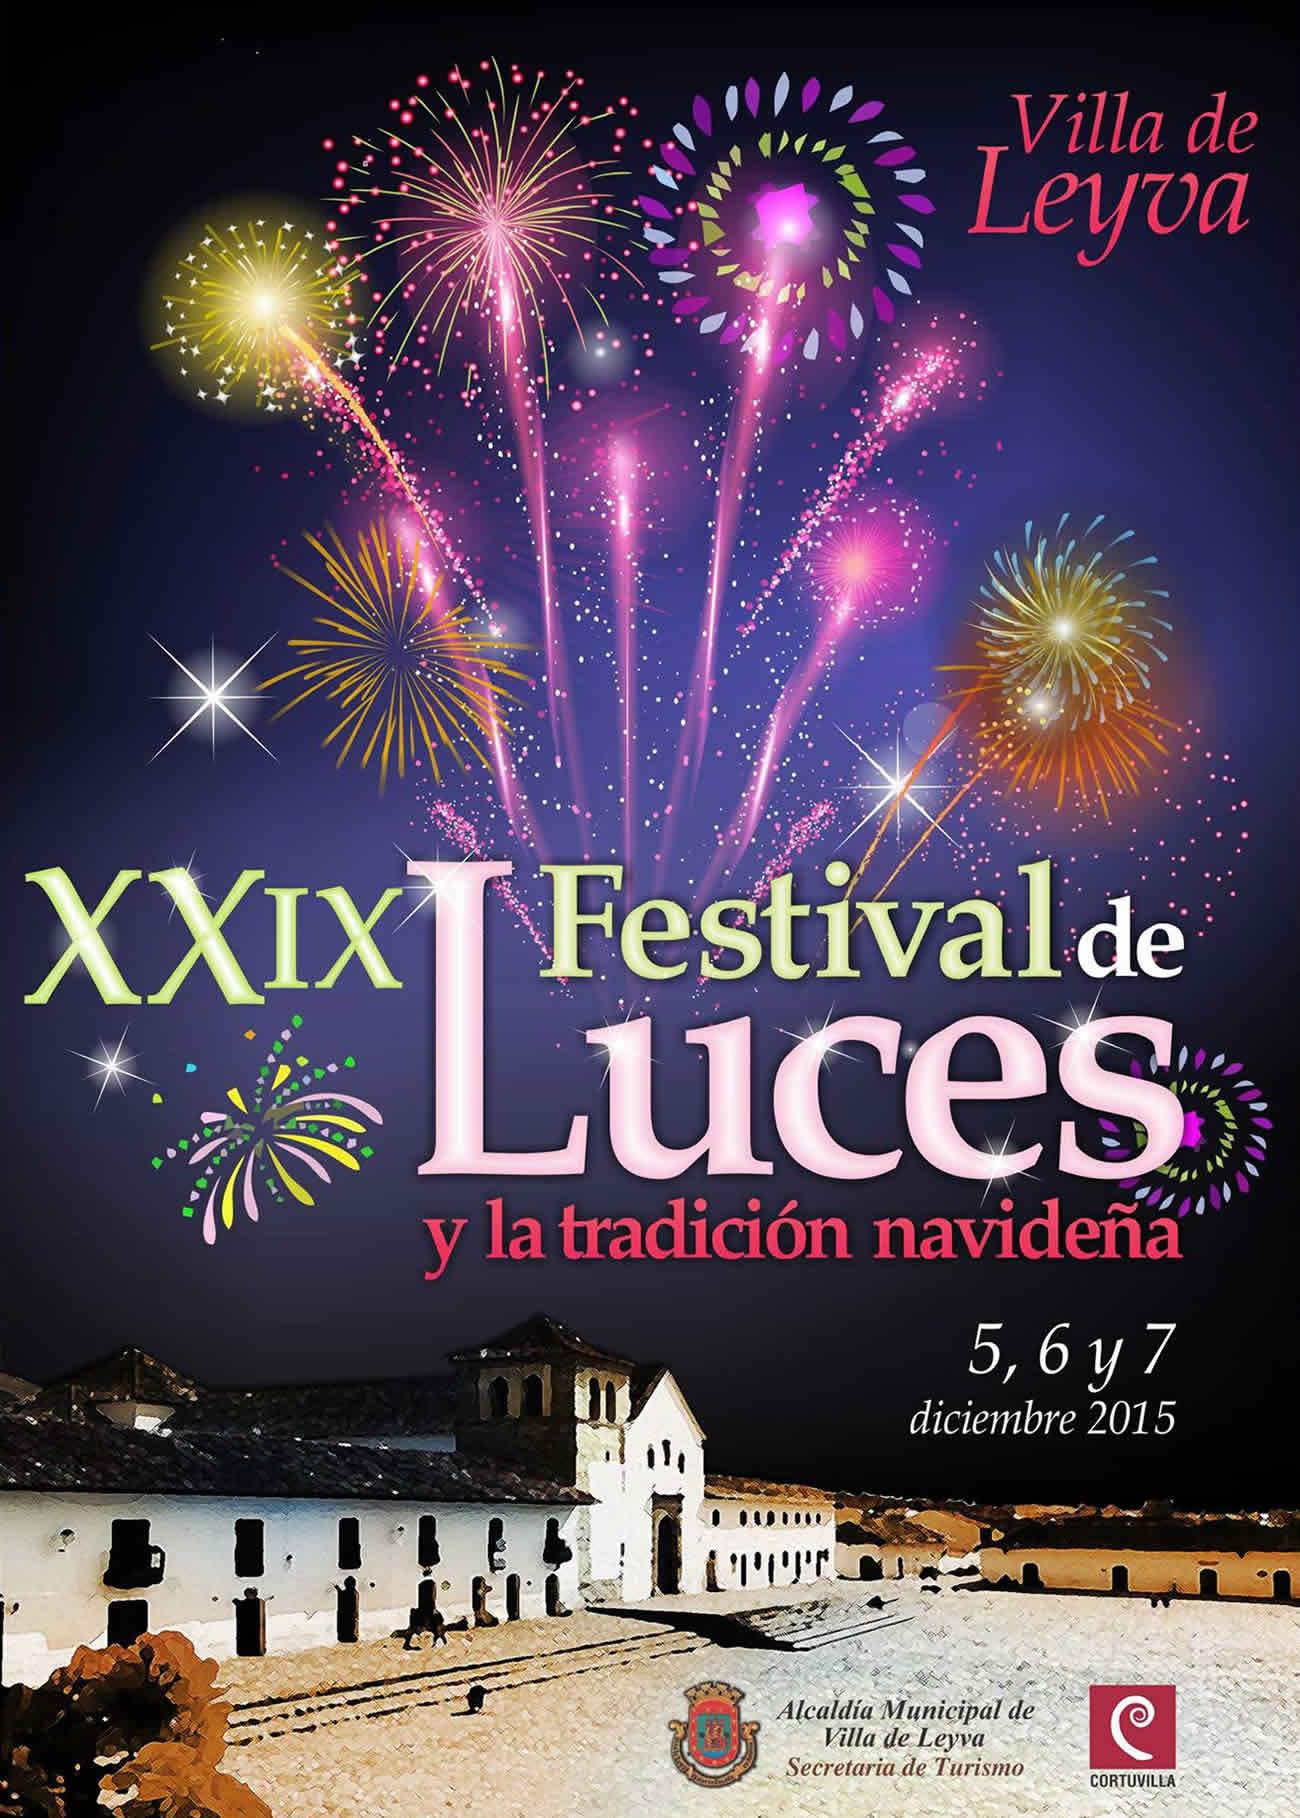 Afiche del festival de luces de Villa de Leyva